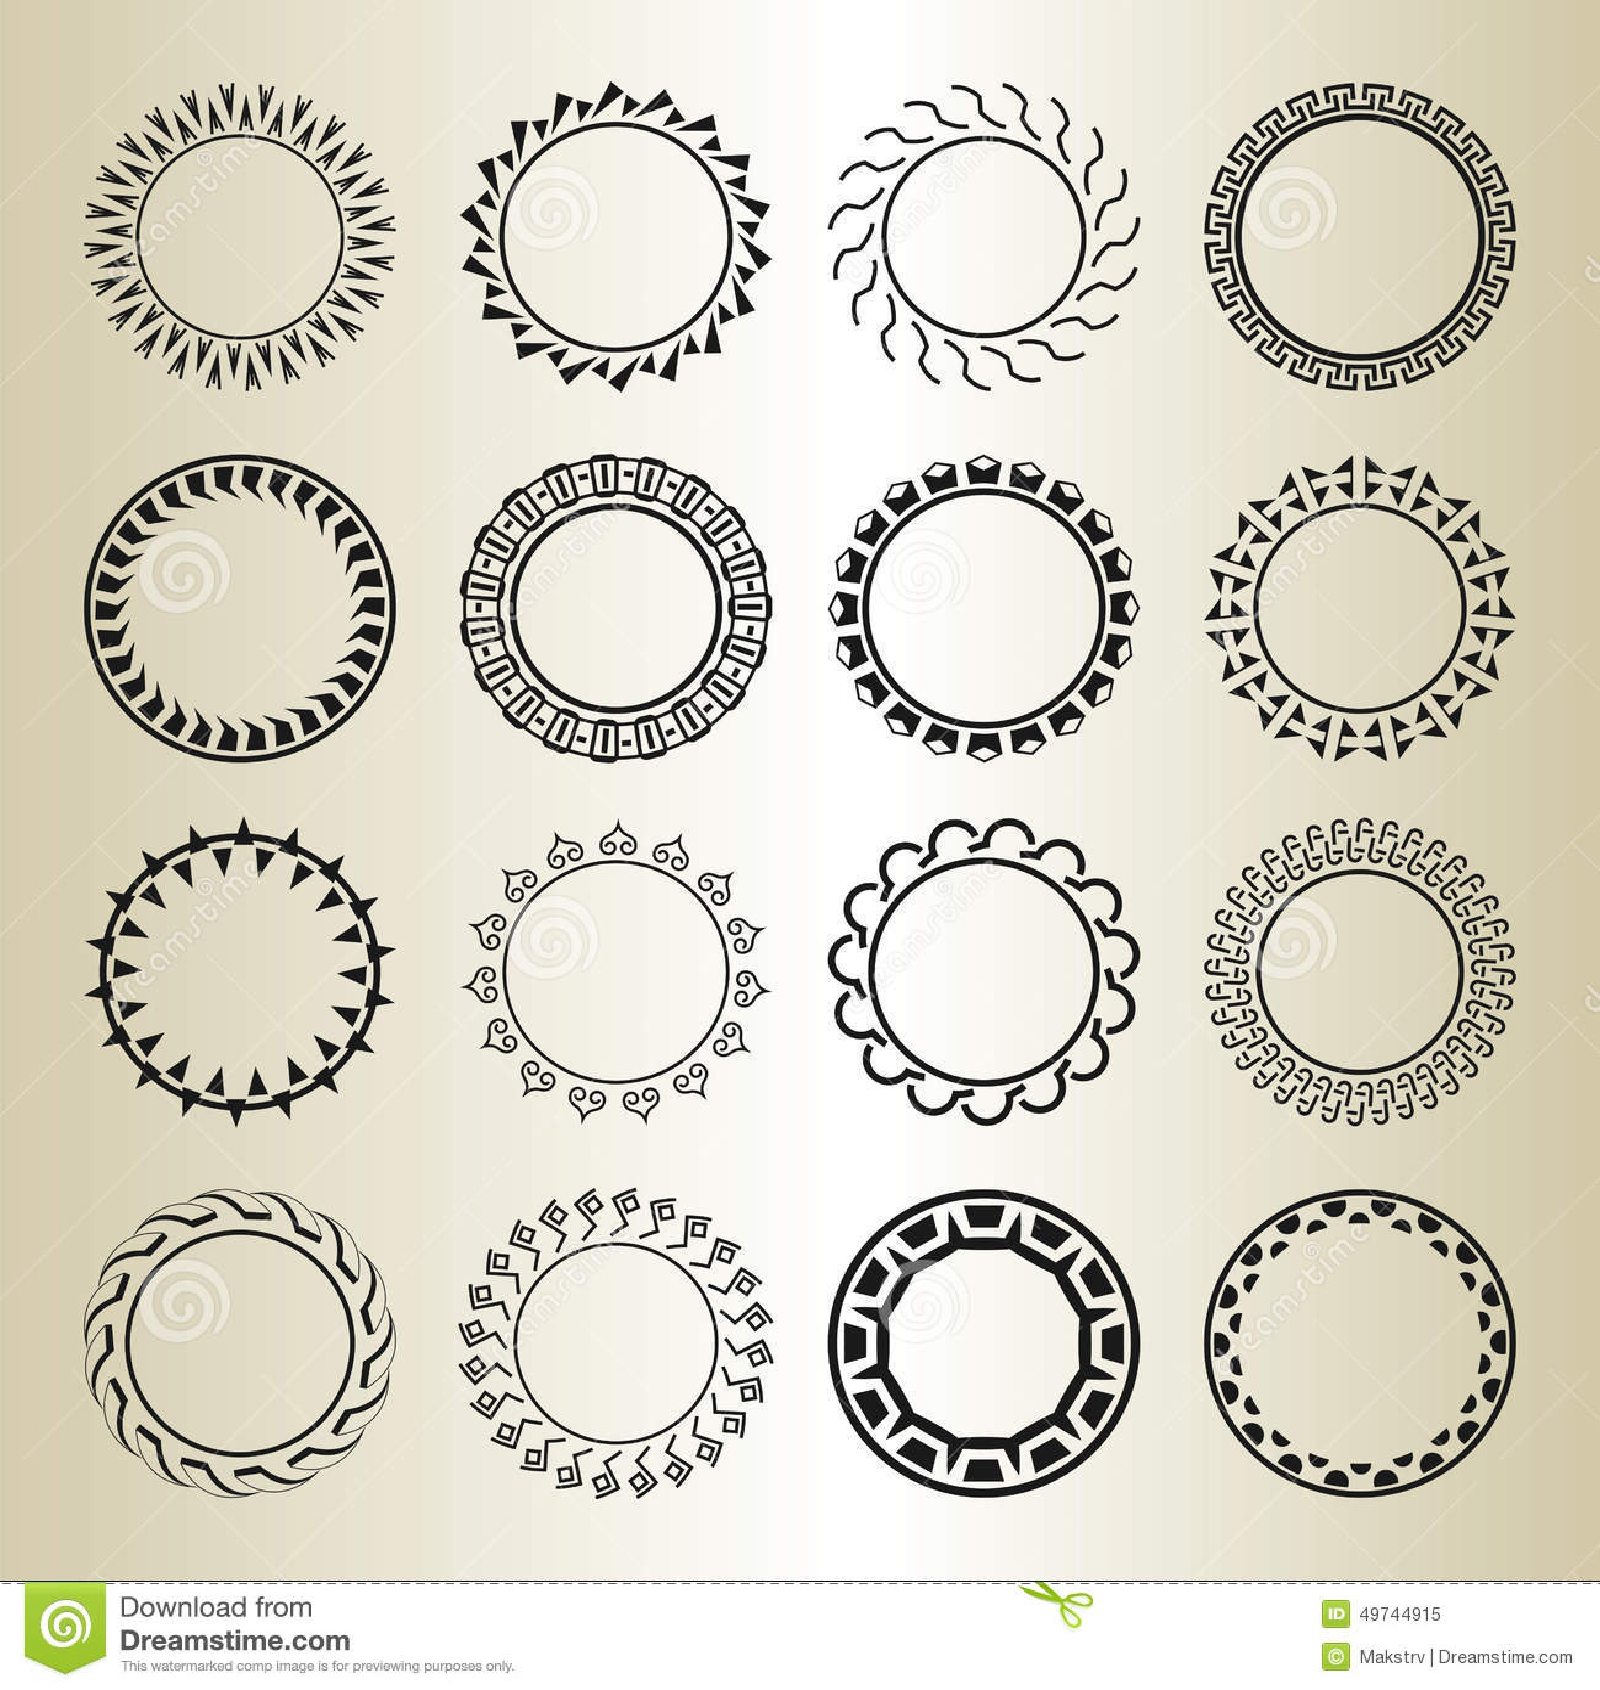 Vector Outline Frames, Logo And Badge Templates. Stock Vector ...